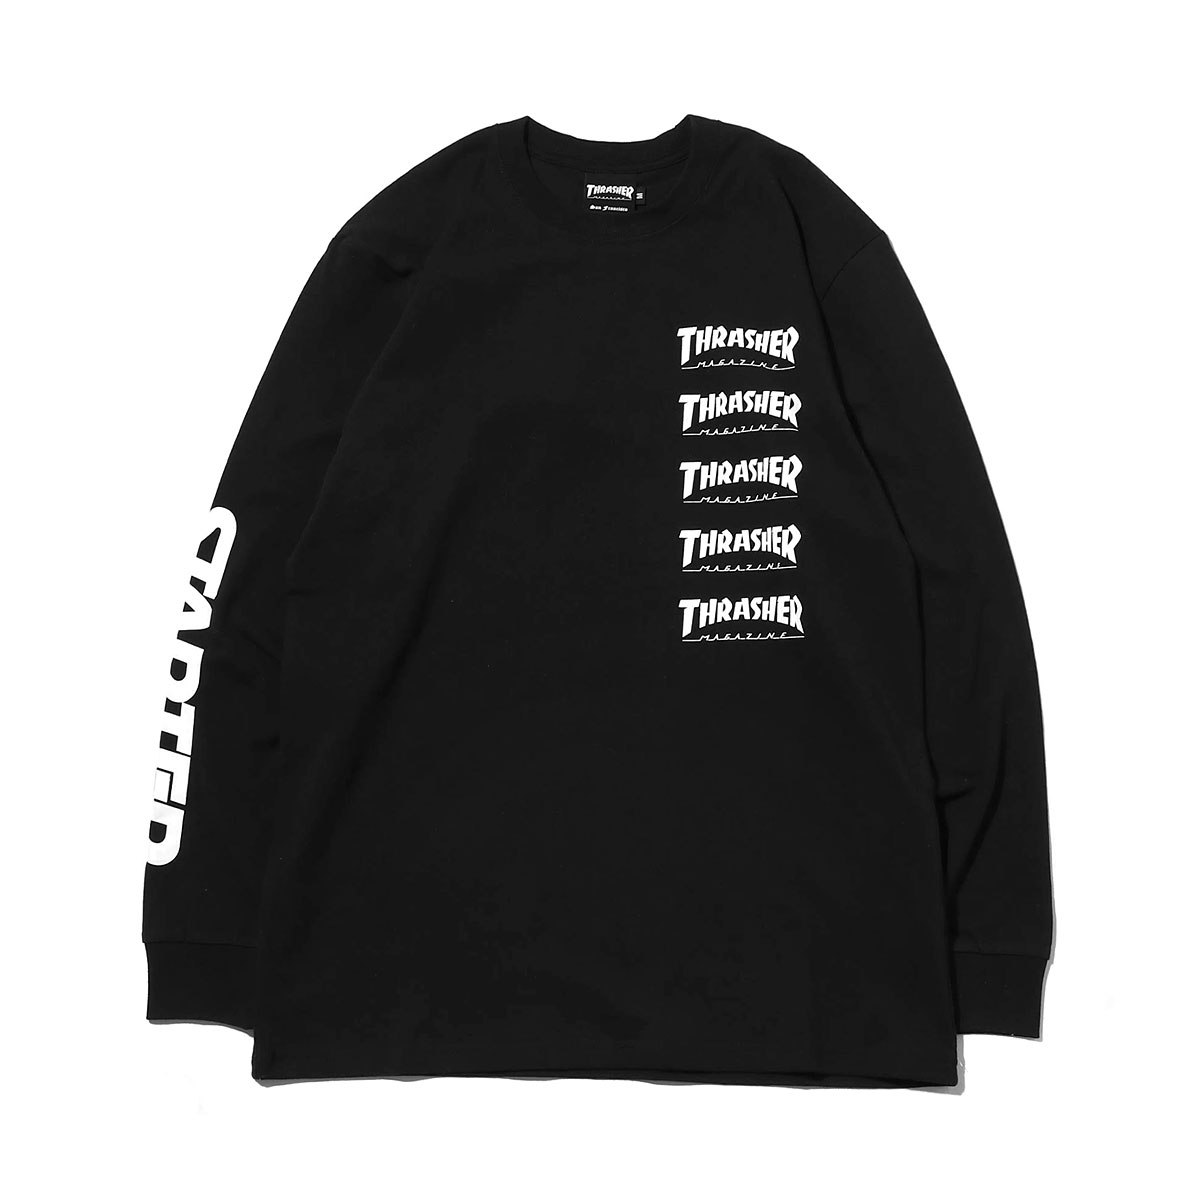 THRASHER x STARTER L/S T-SHIRT (スラッシャー x スターター ロングスリーブ ティーシャツ)BLACK【メンズ 長袖Tシャツ】18FW-I